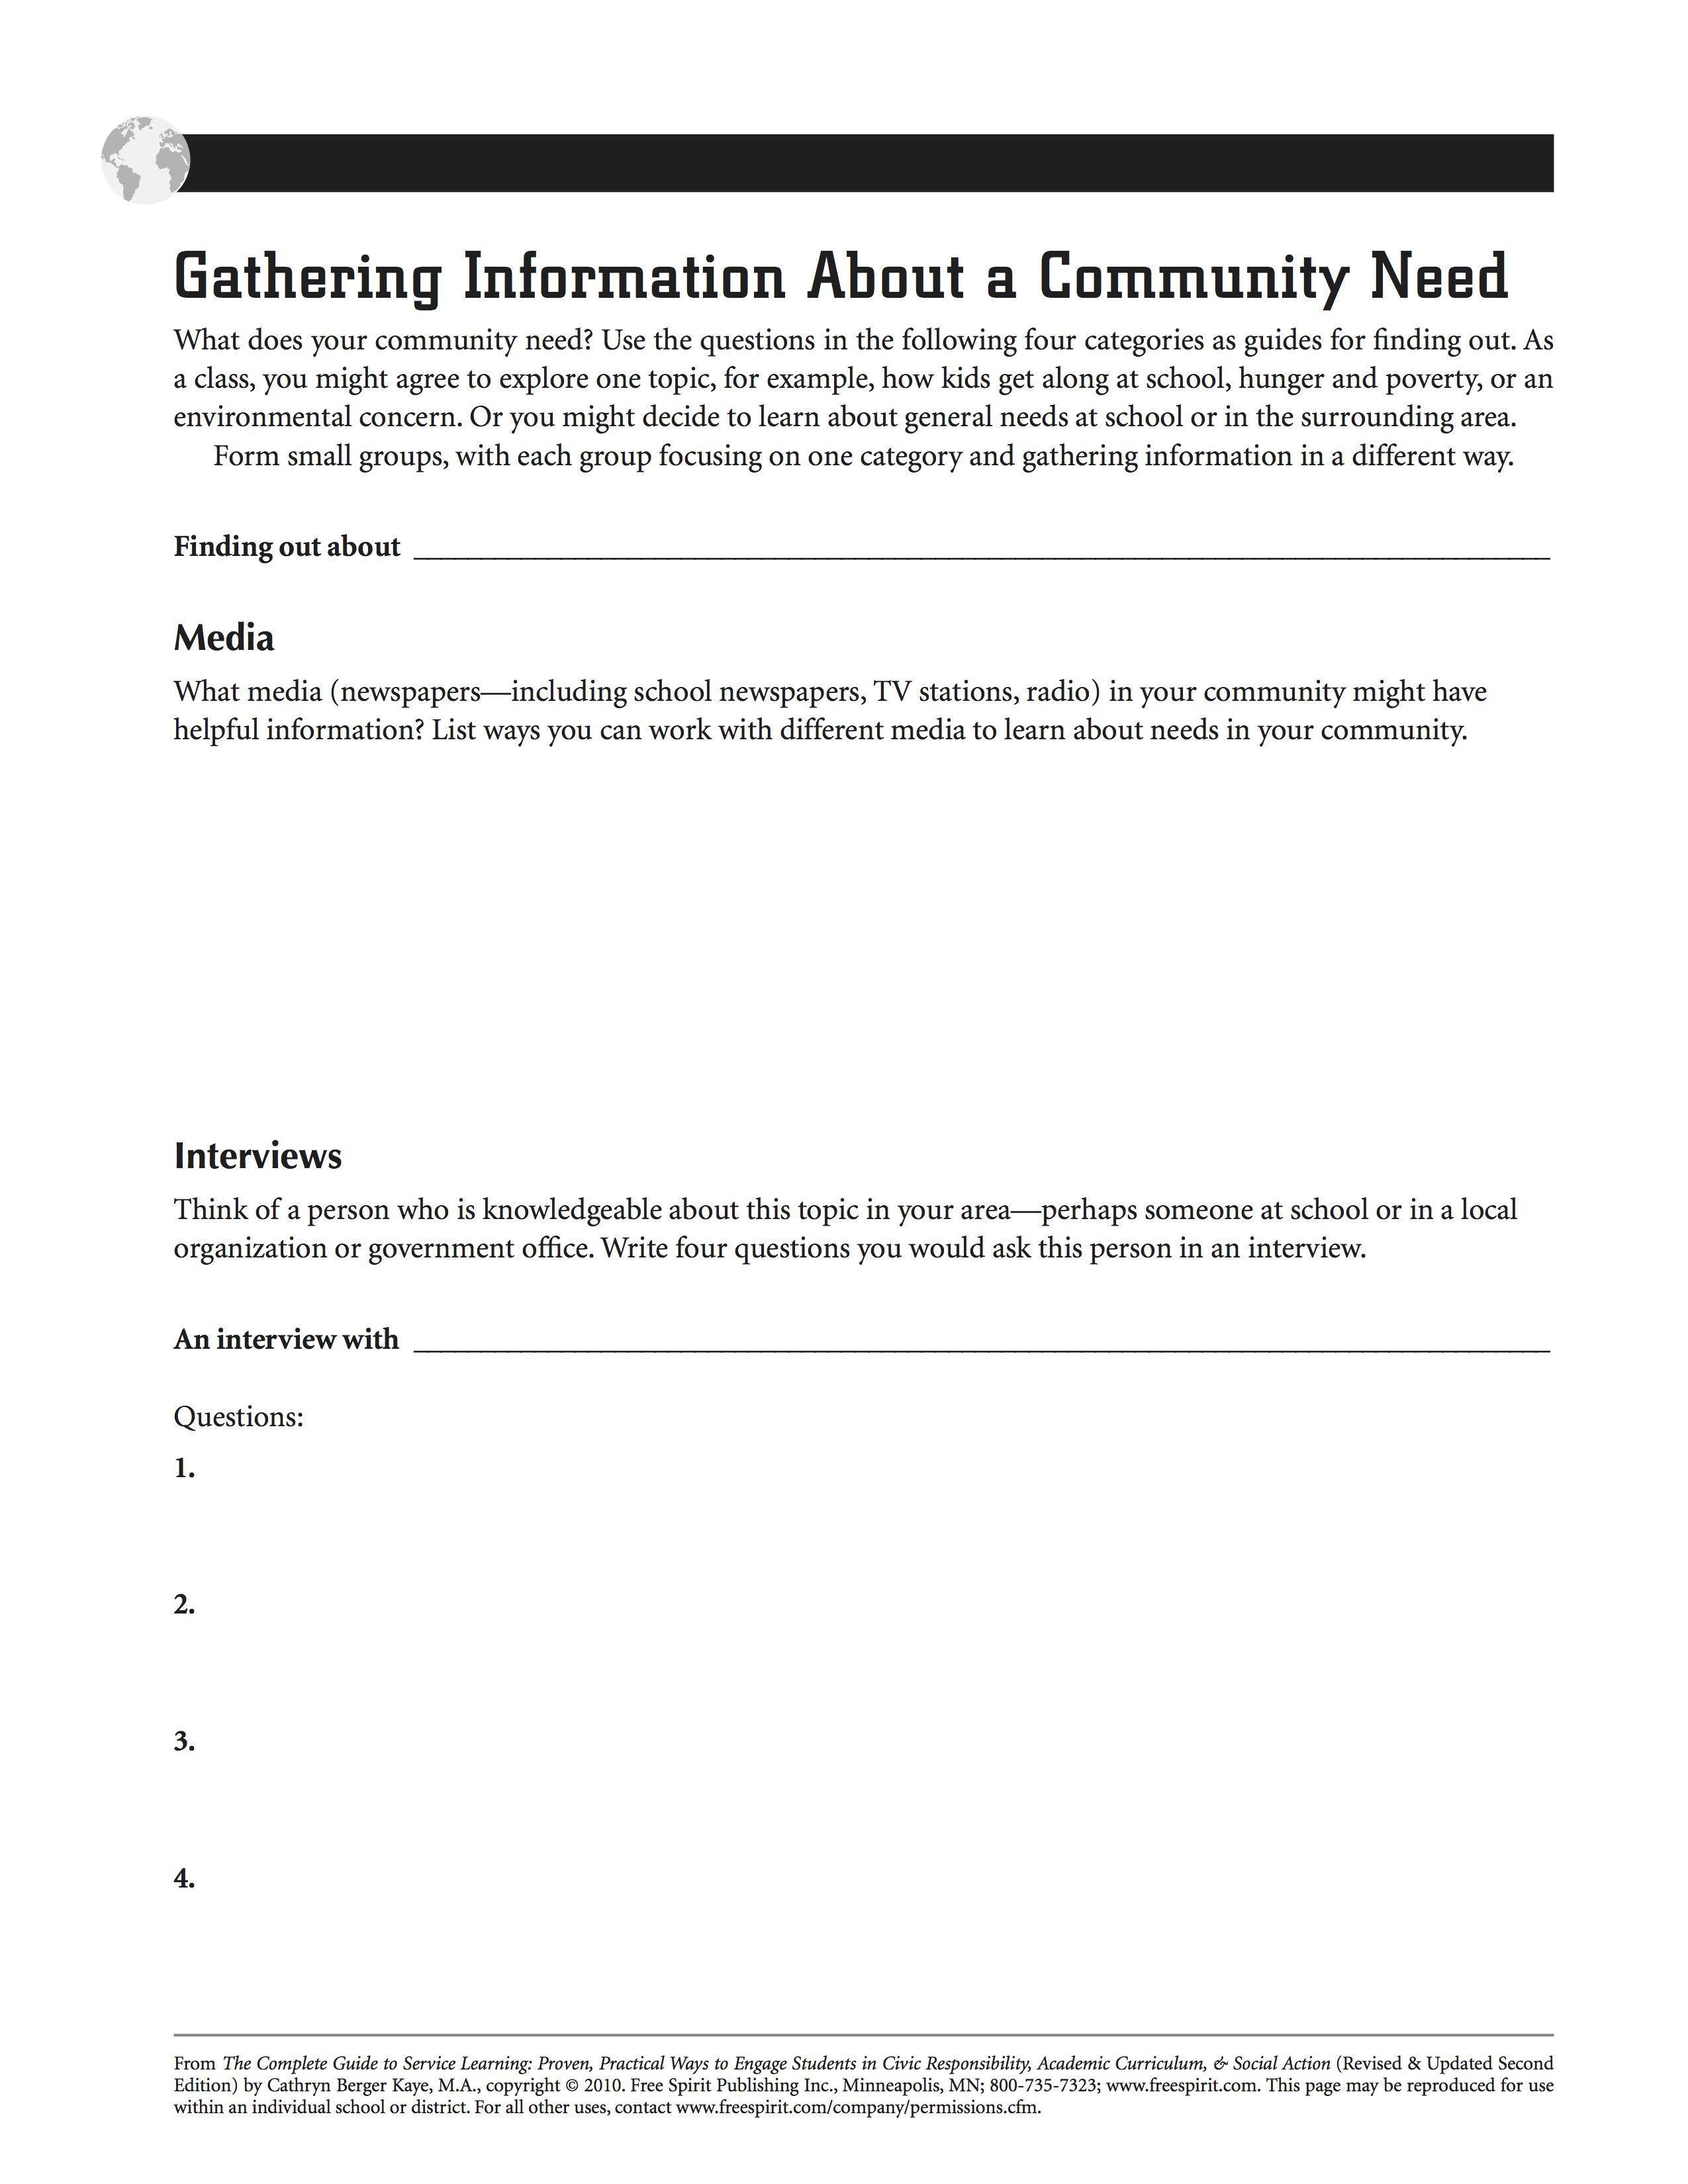 Free Printable Service Learning Worksheet: Gathering Information | Community Service Printable Worksheets